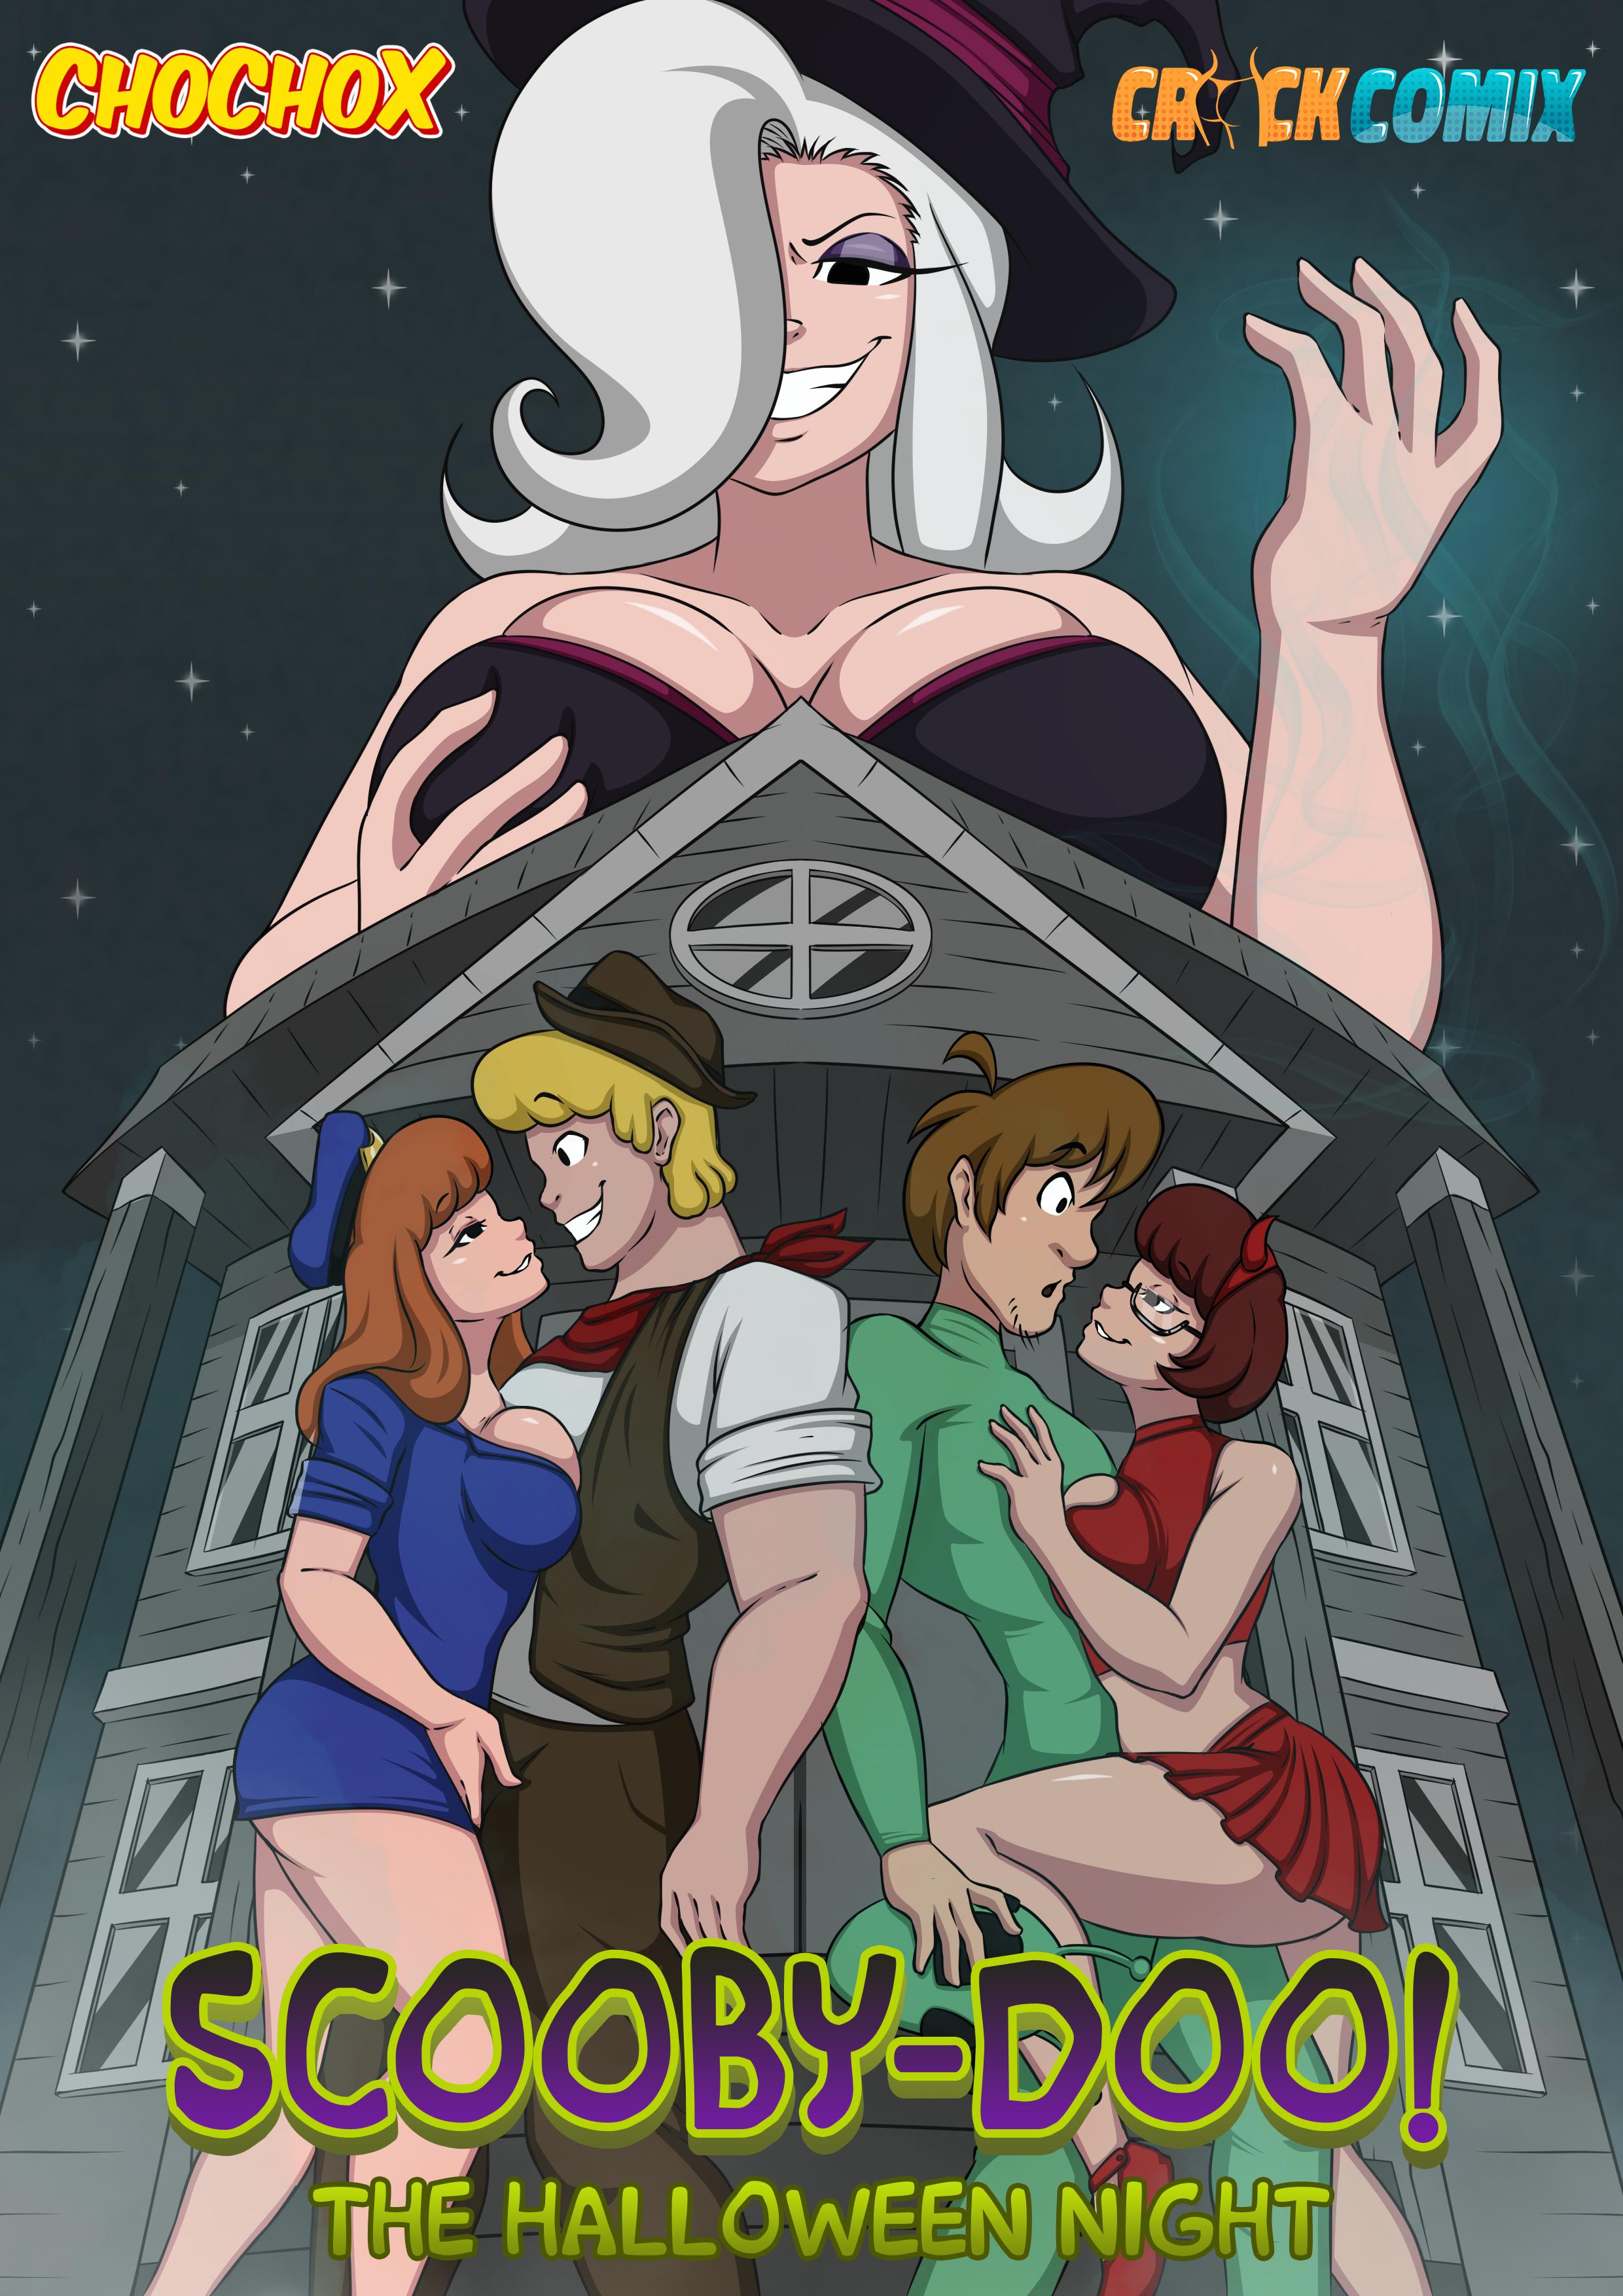 Scooby Doo The Halloween Night Chochox